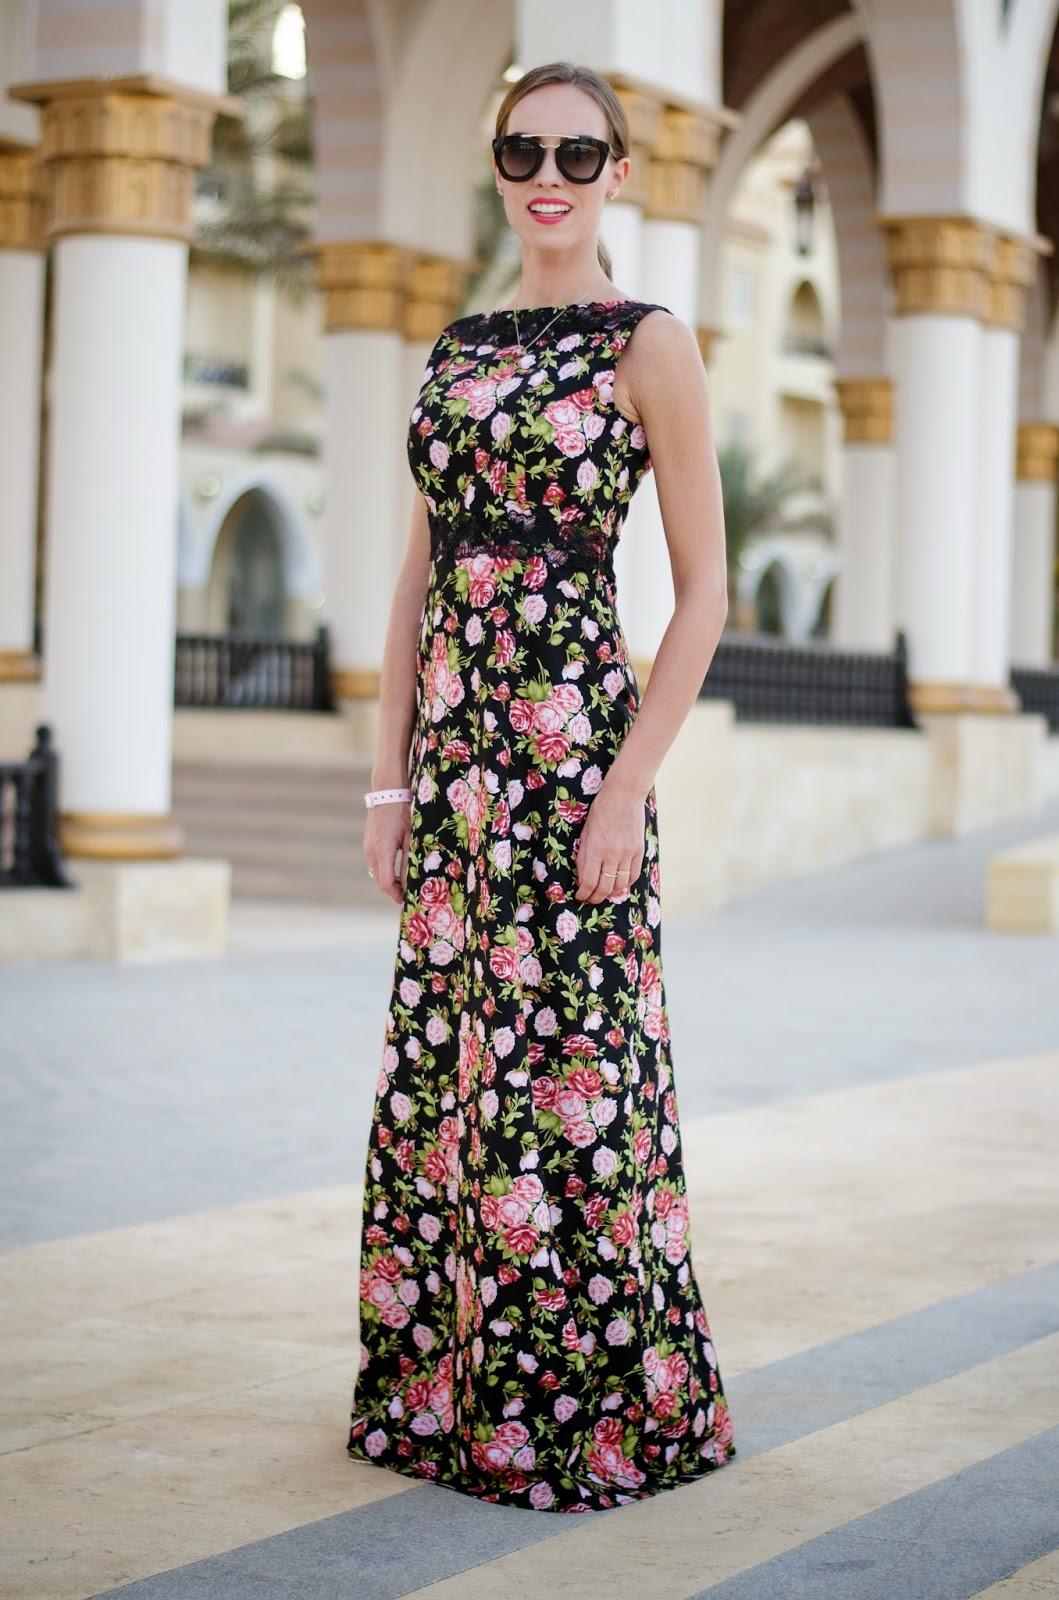 kristjaana mere summer maxi dress floral lace